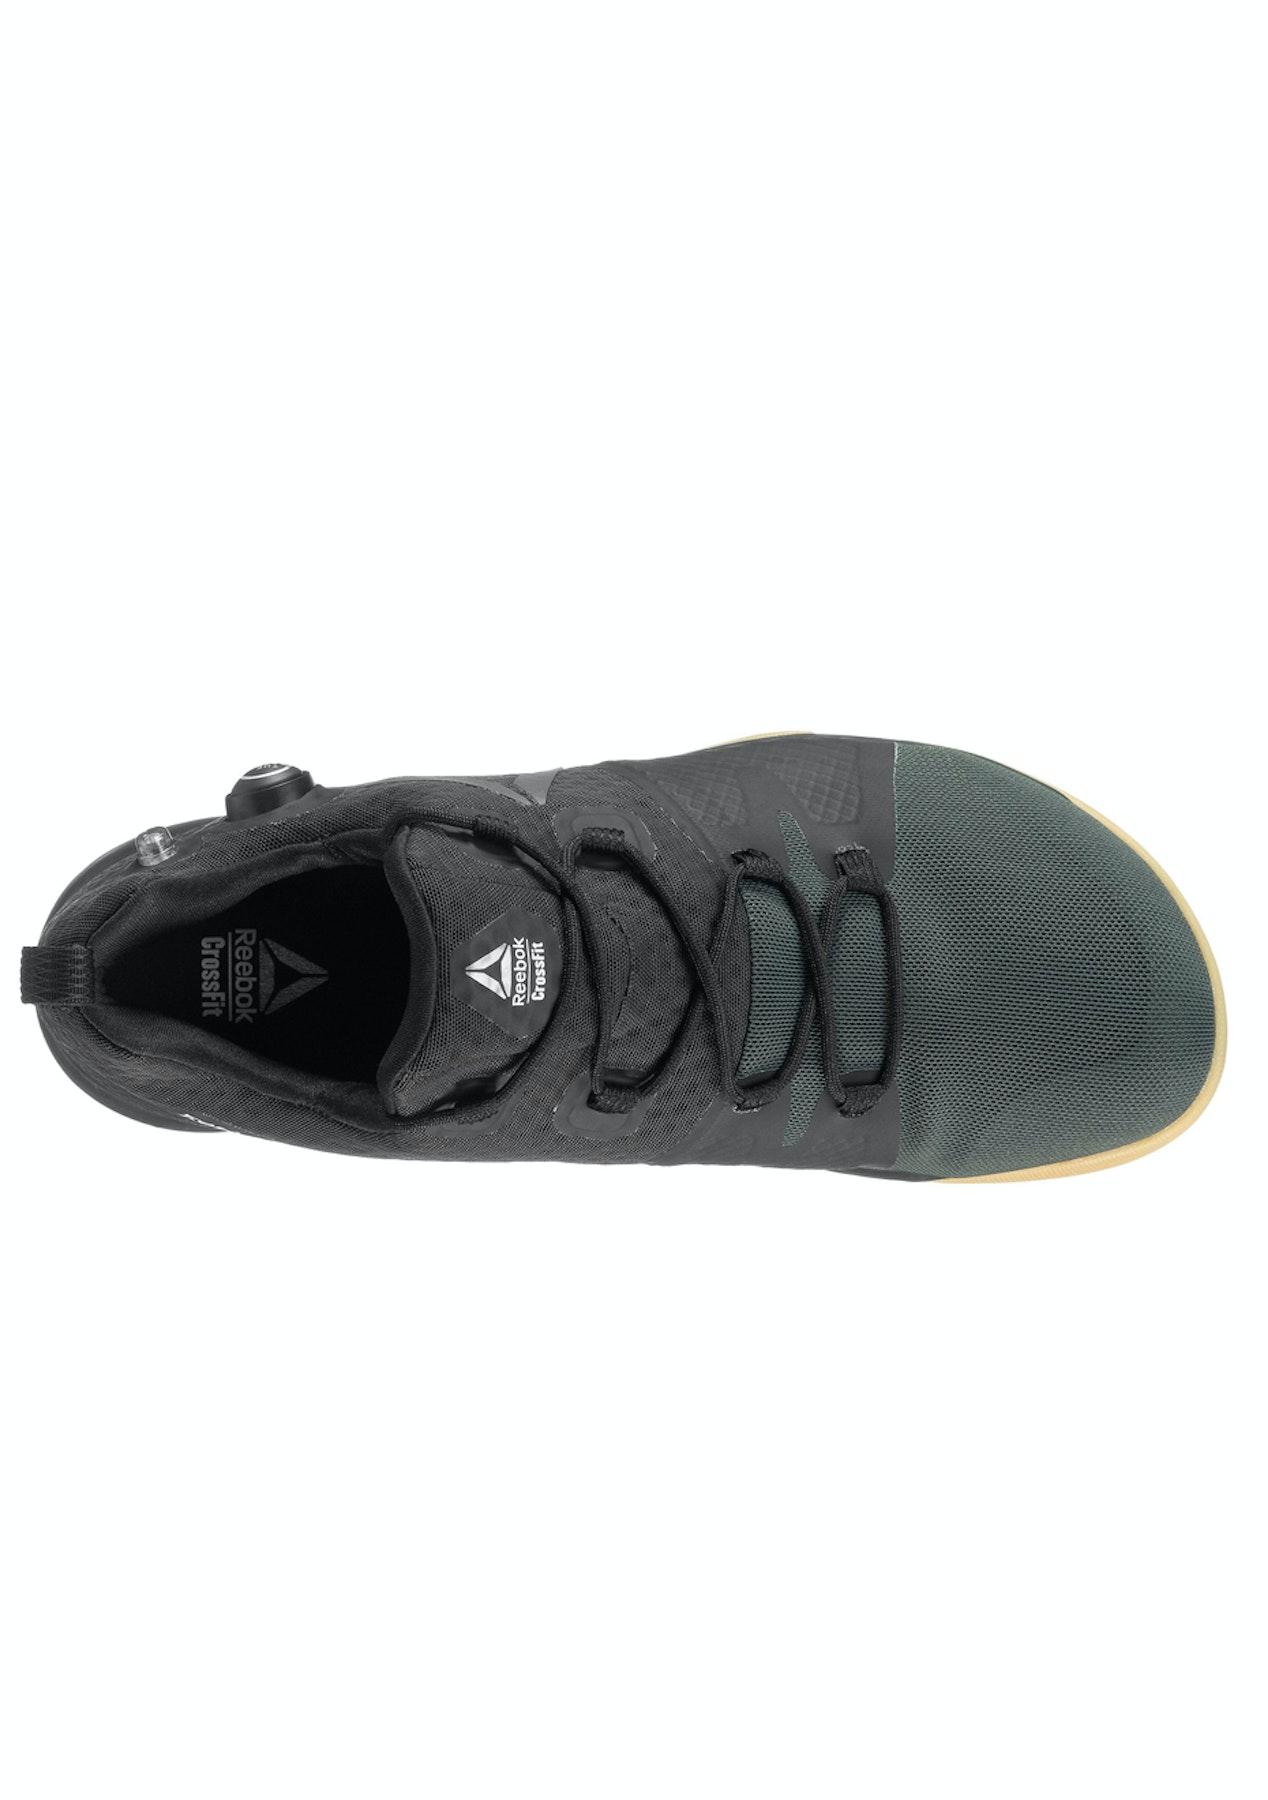 d3eca9fc6281ec Reebok Mens - R Crossfit Nano Pump - Black Coal Classic White Gum Pewter -  Mens Shoe Sale - Onceit